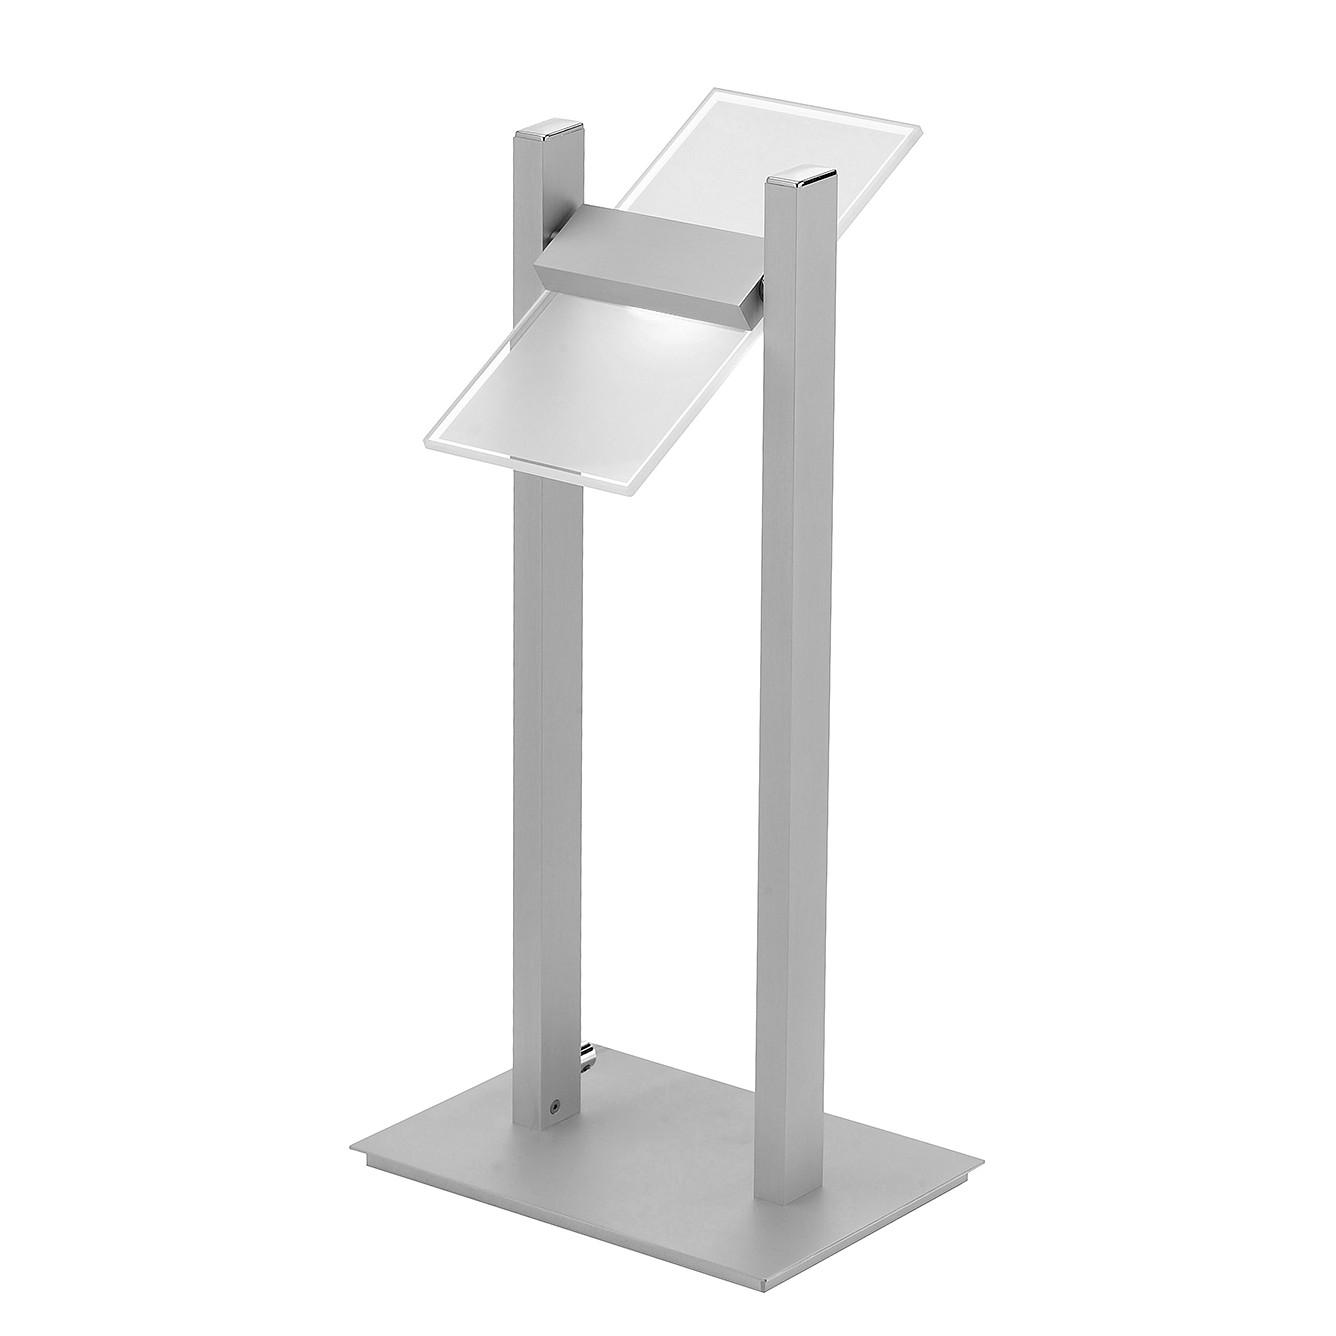 LED-Tischleuchte Pukka ● Aluminium ● Silber- Paul Neuhaus A++